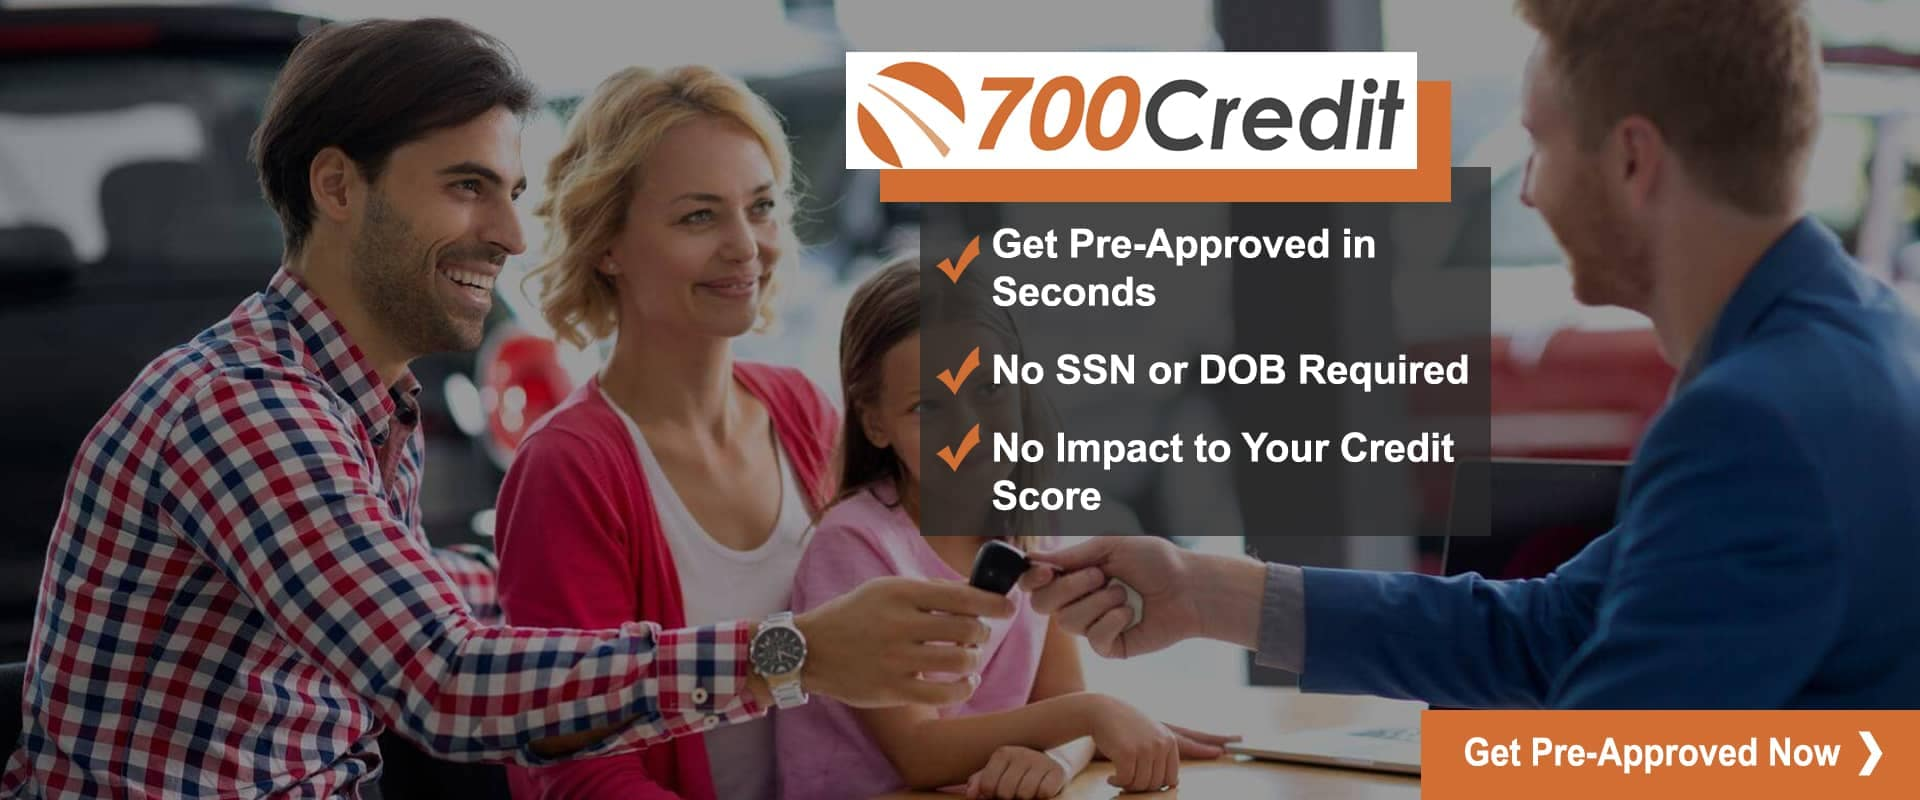 700 Credit app